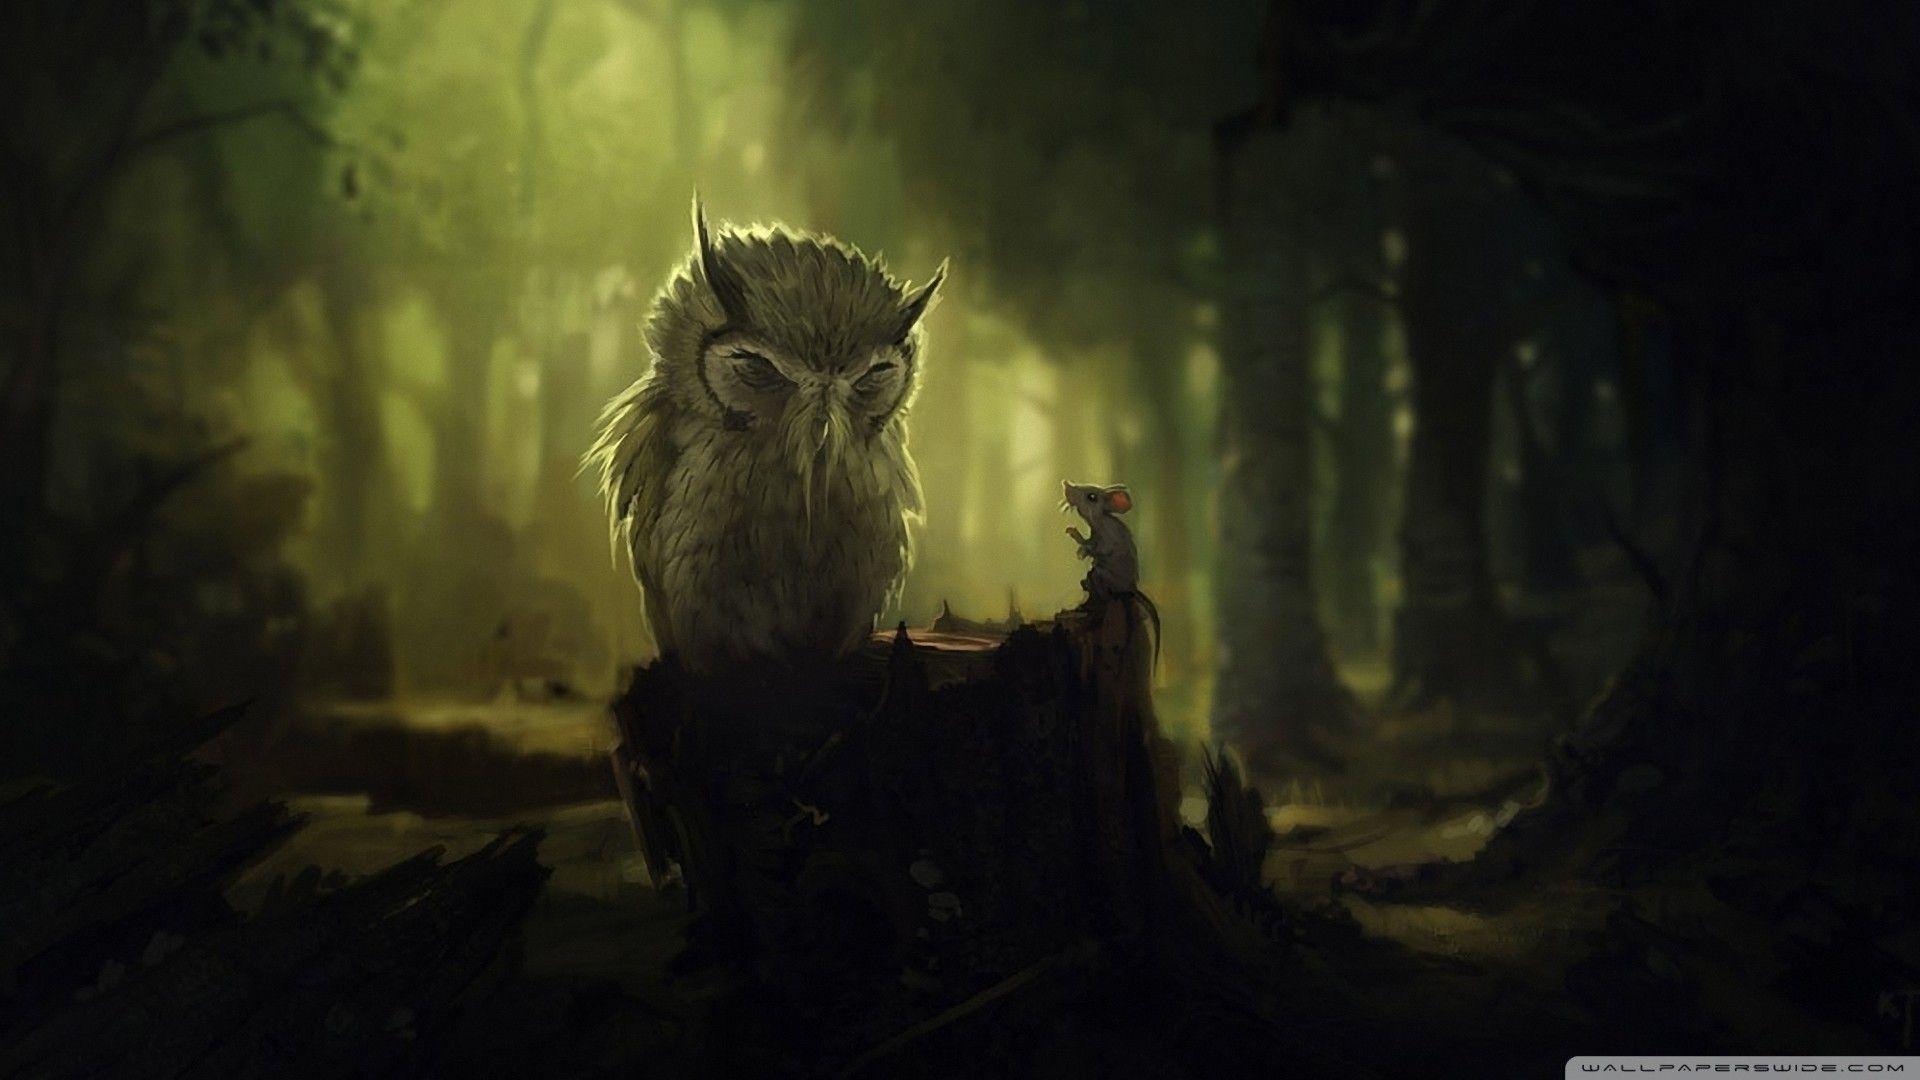 Owl City HD Wallpapers - Wallpaper Cave